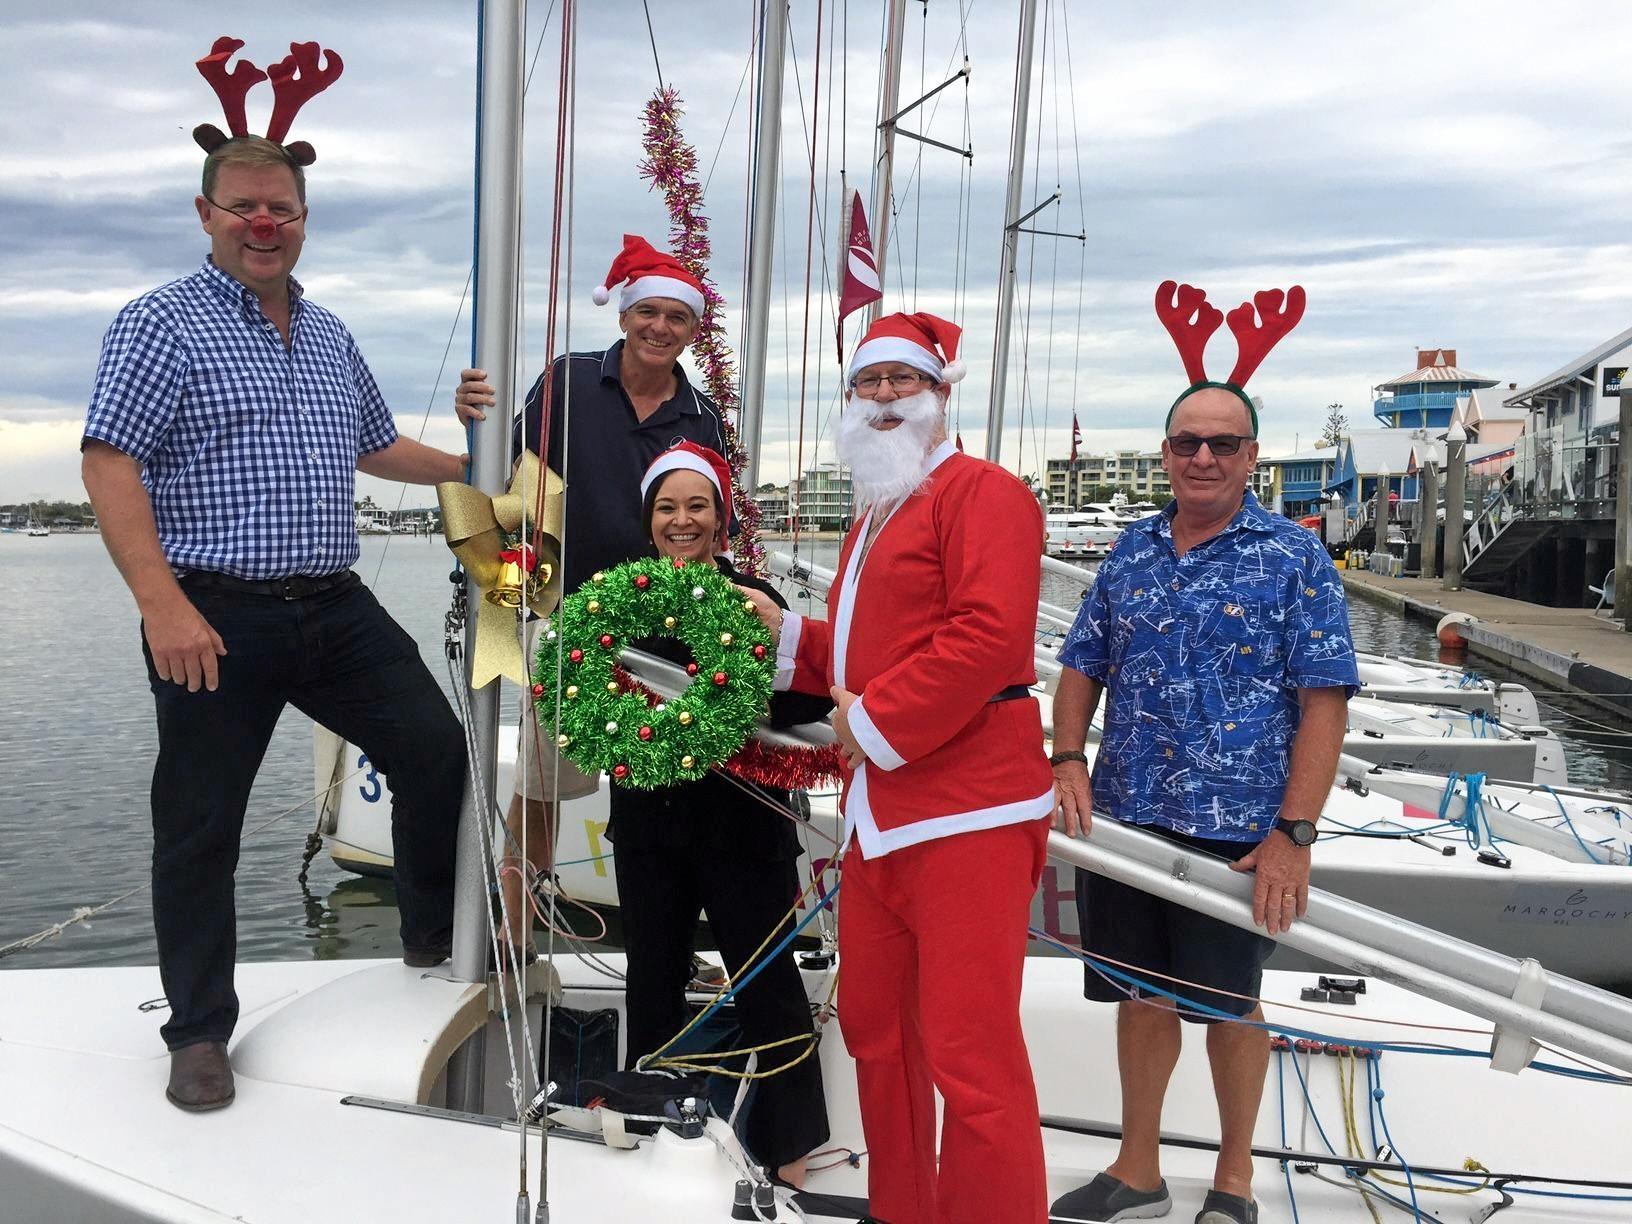 WATER FESTIVITIES: Mooloolaba Christmas Boat Parade will light up Mooloolaba.